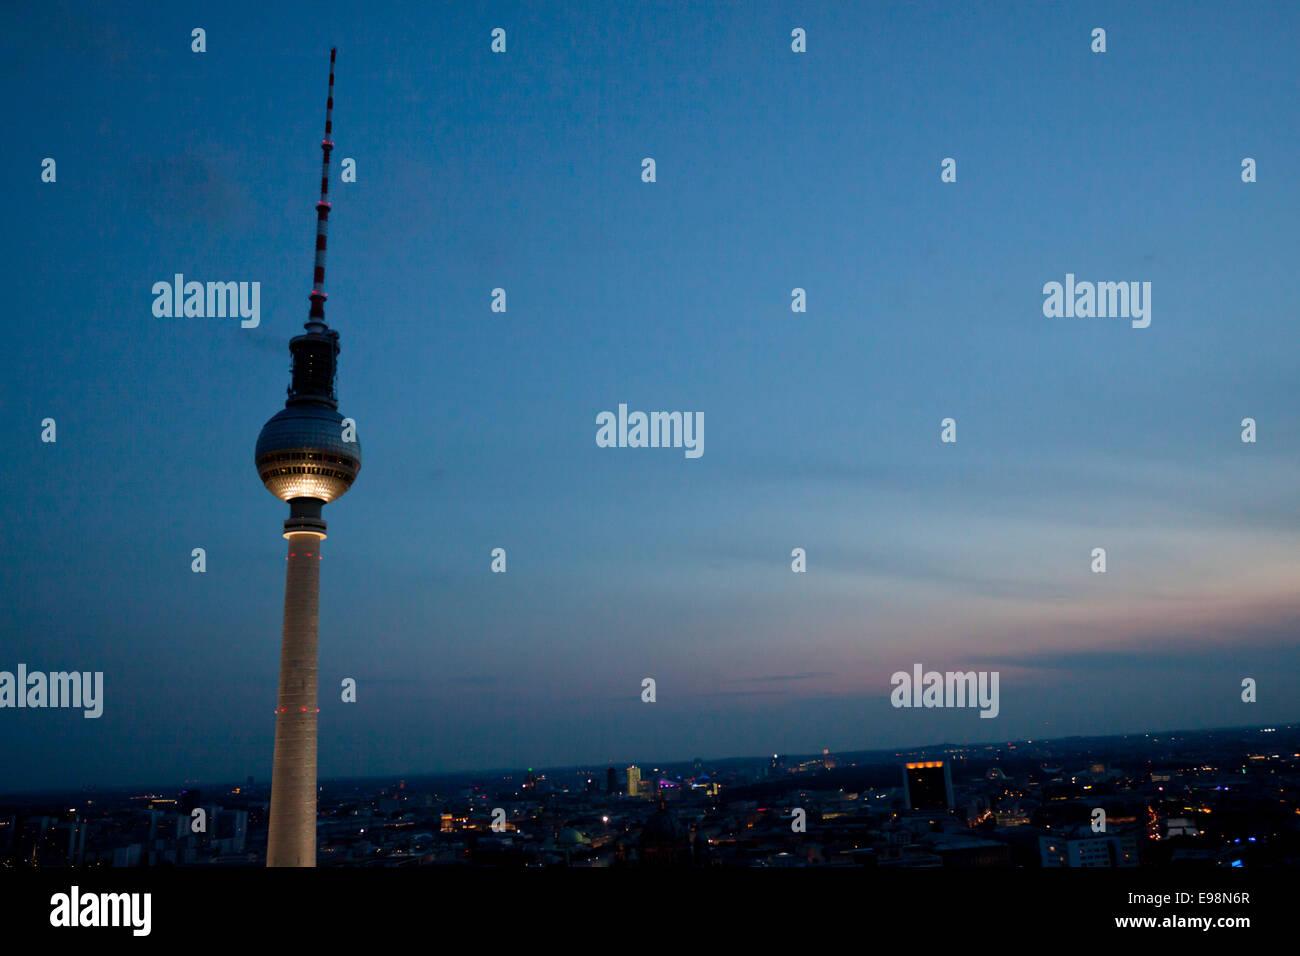 Fernsehturm television tower at dusk in a summer of 2014. Berlin, Berlin-Brandenburg. Germany - Stock Image